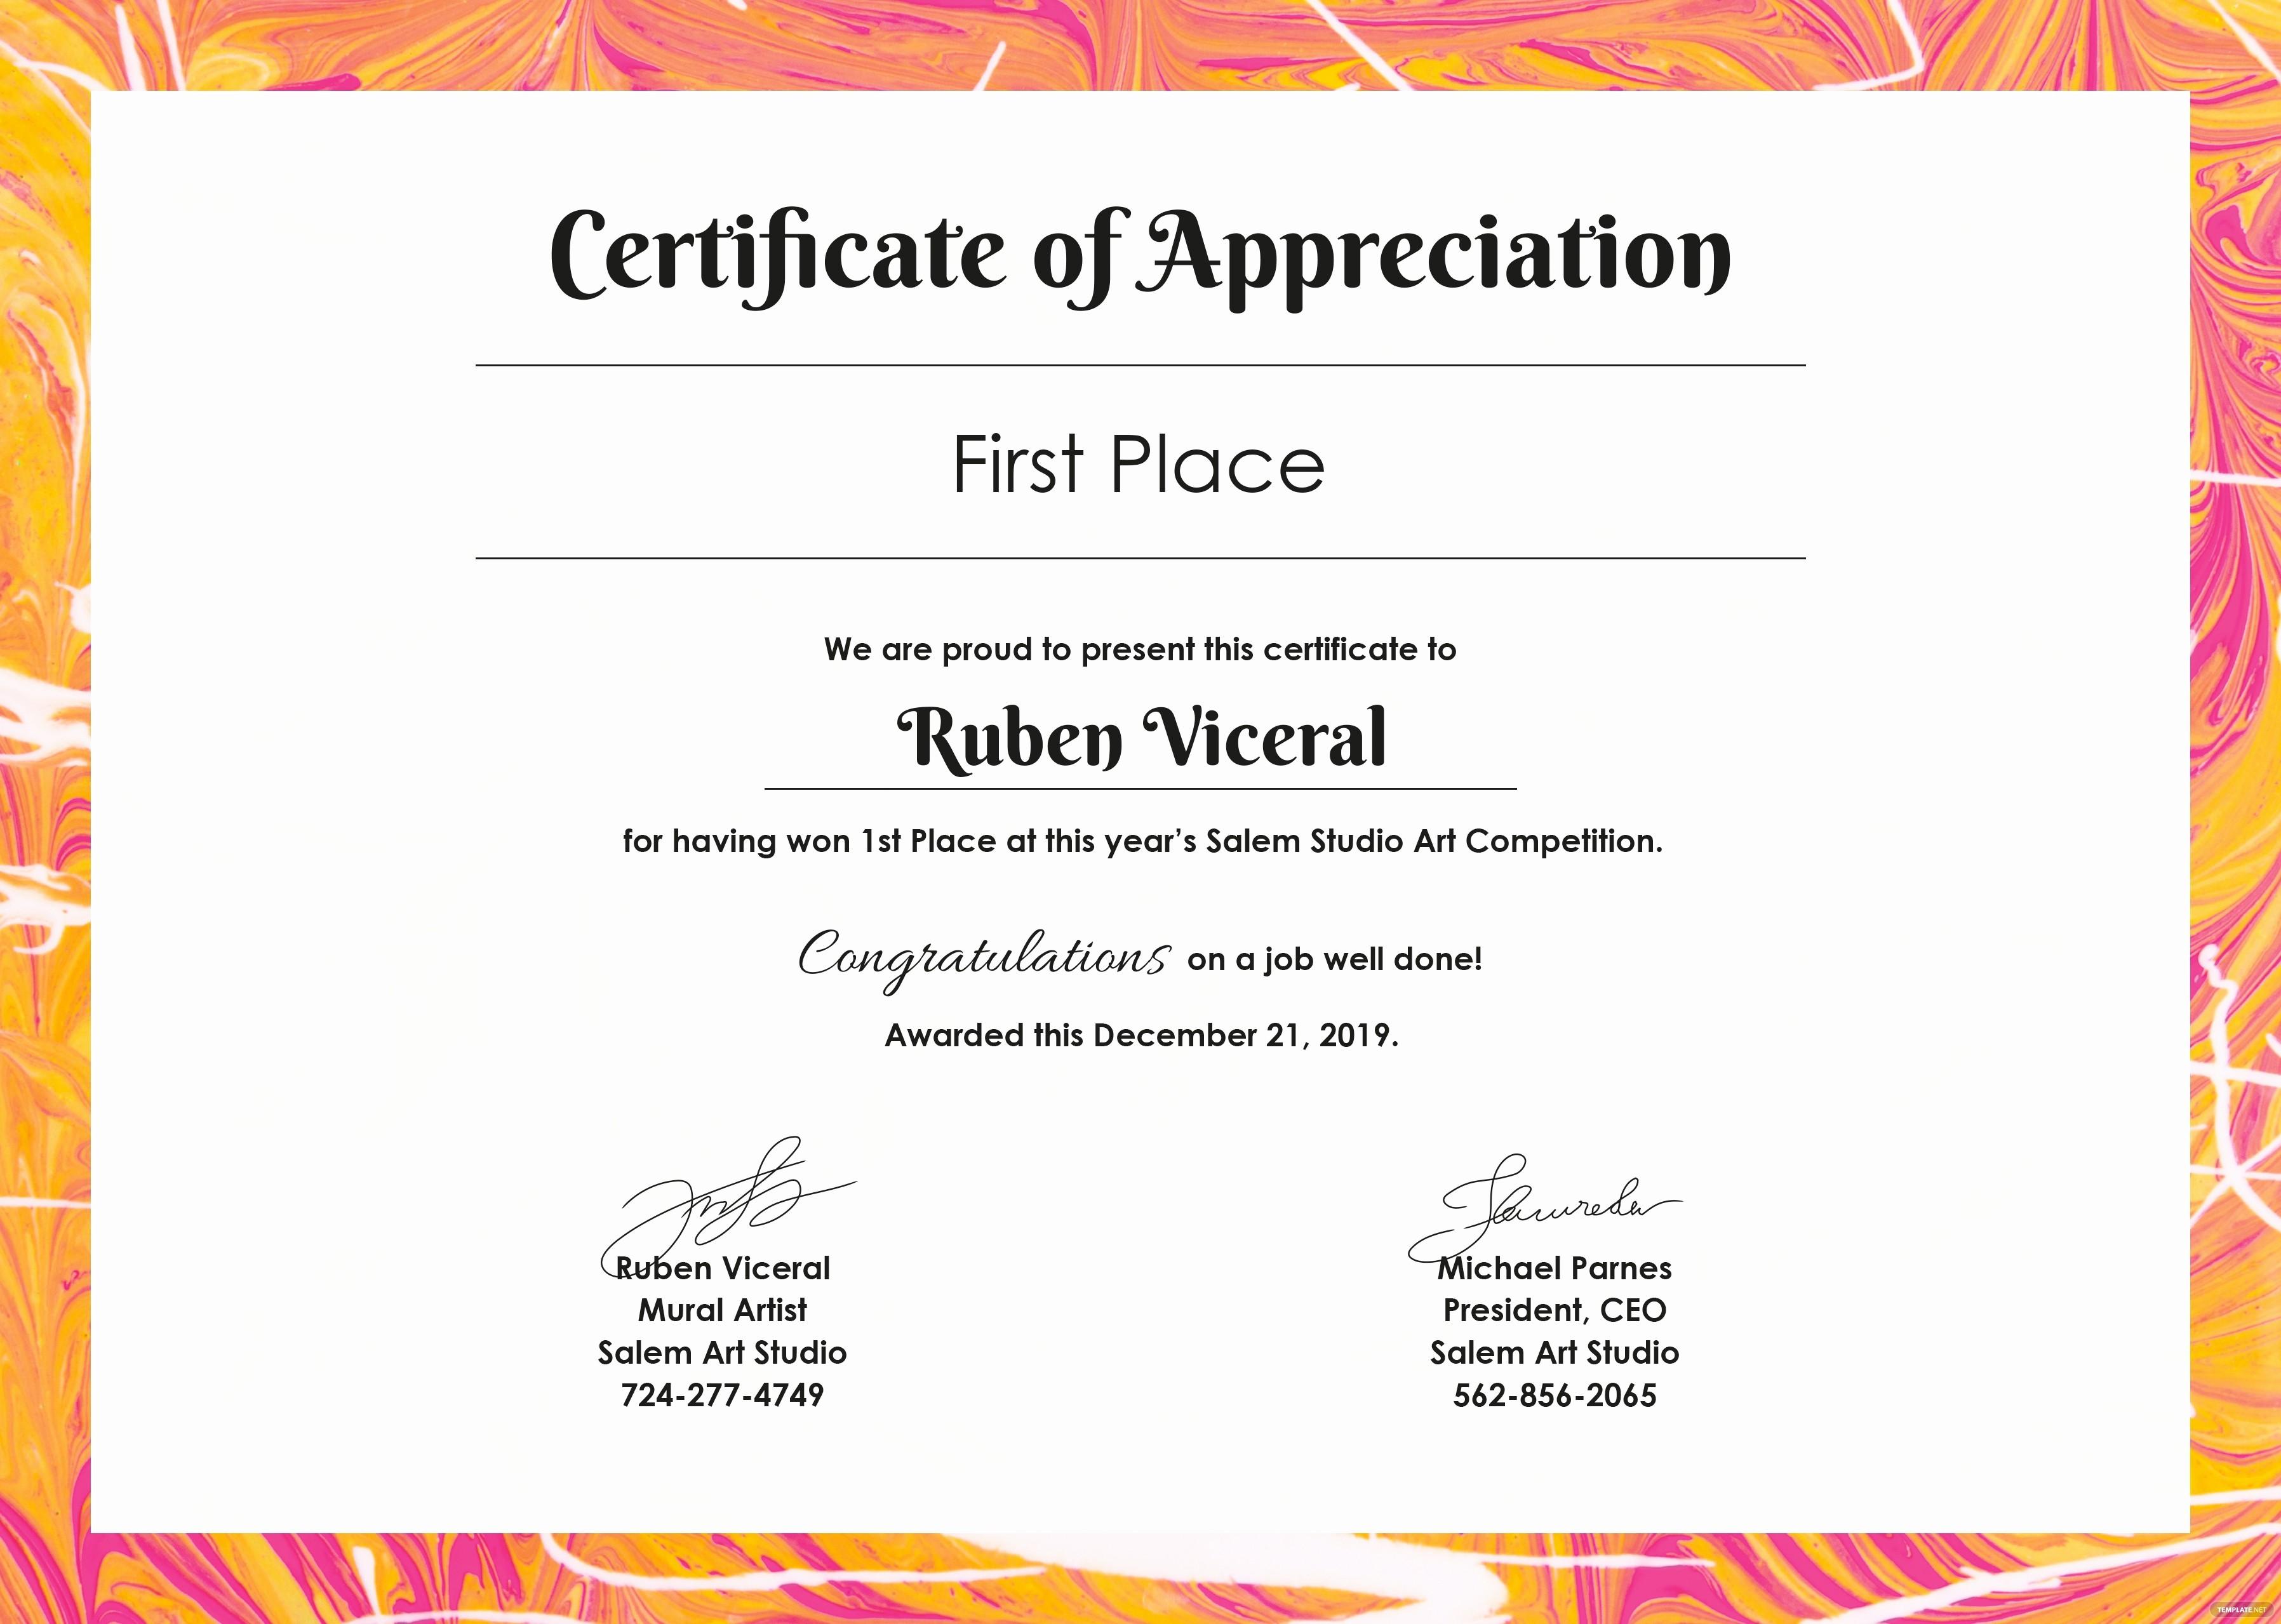 Template for Certificate Of Appreciation Best Of Free Appreciation Certificate Template In Adobe Shop